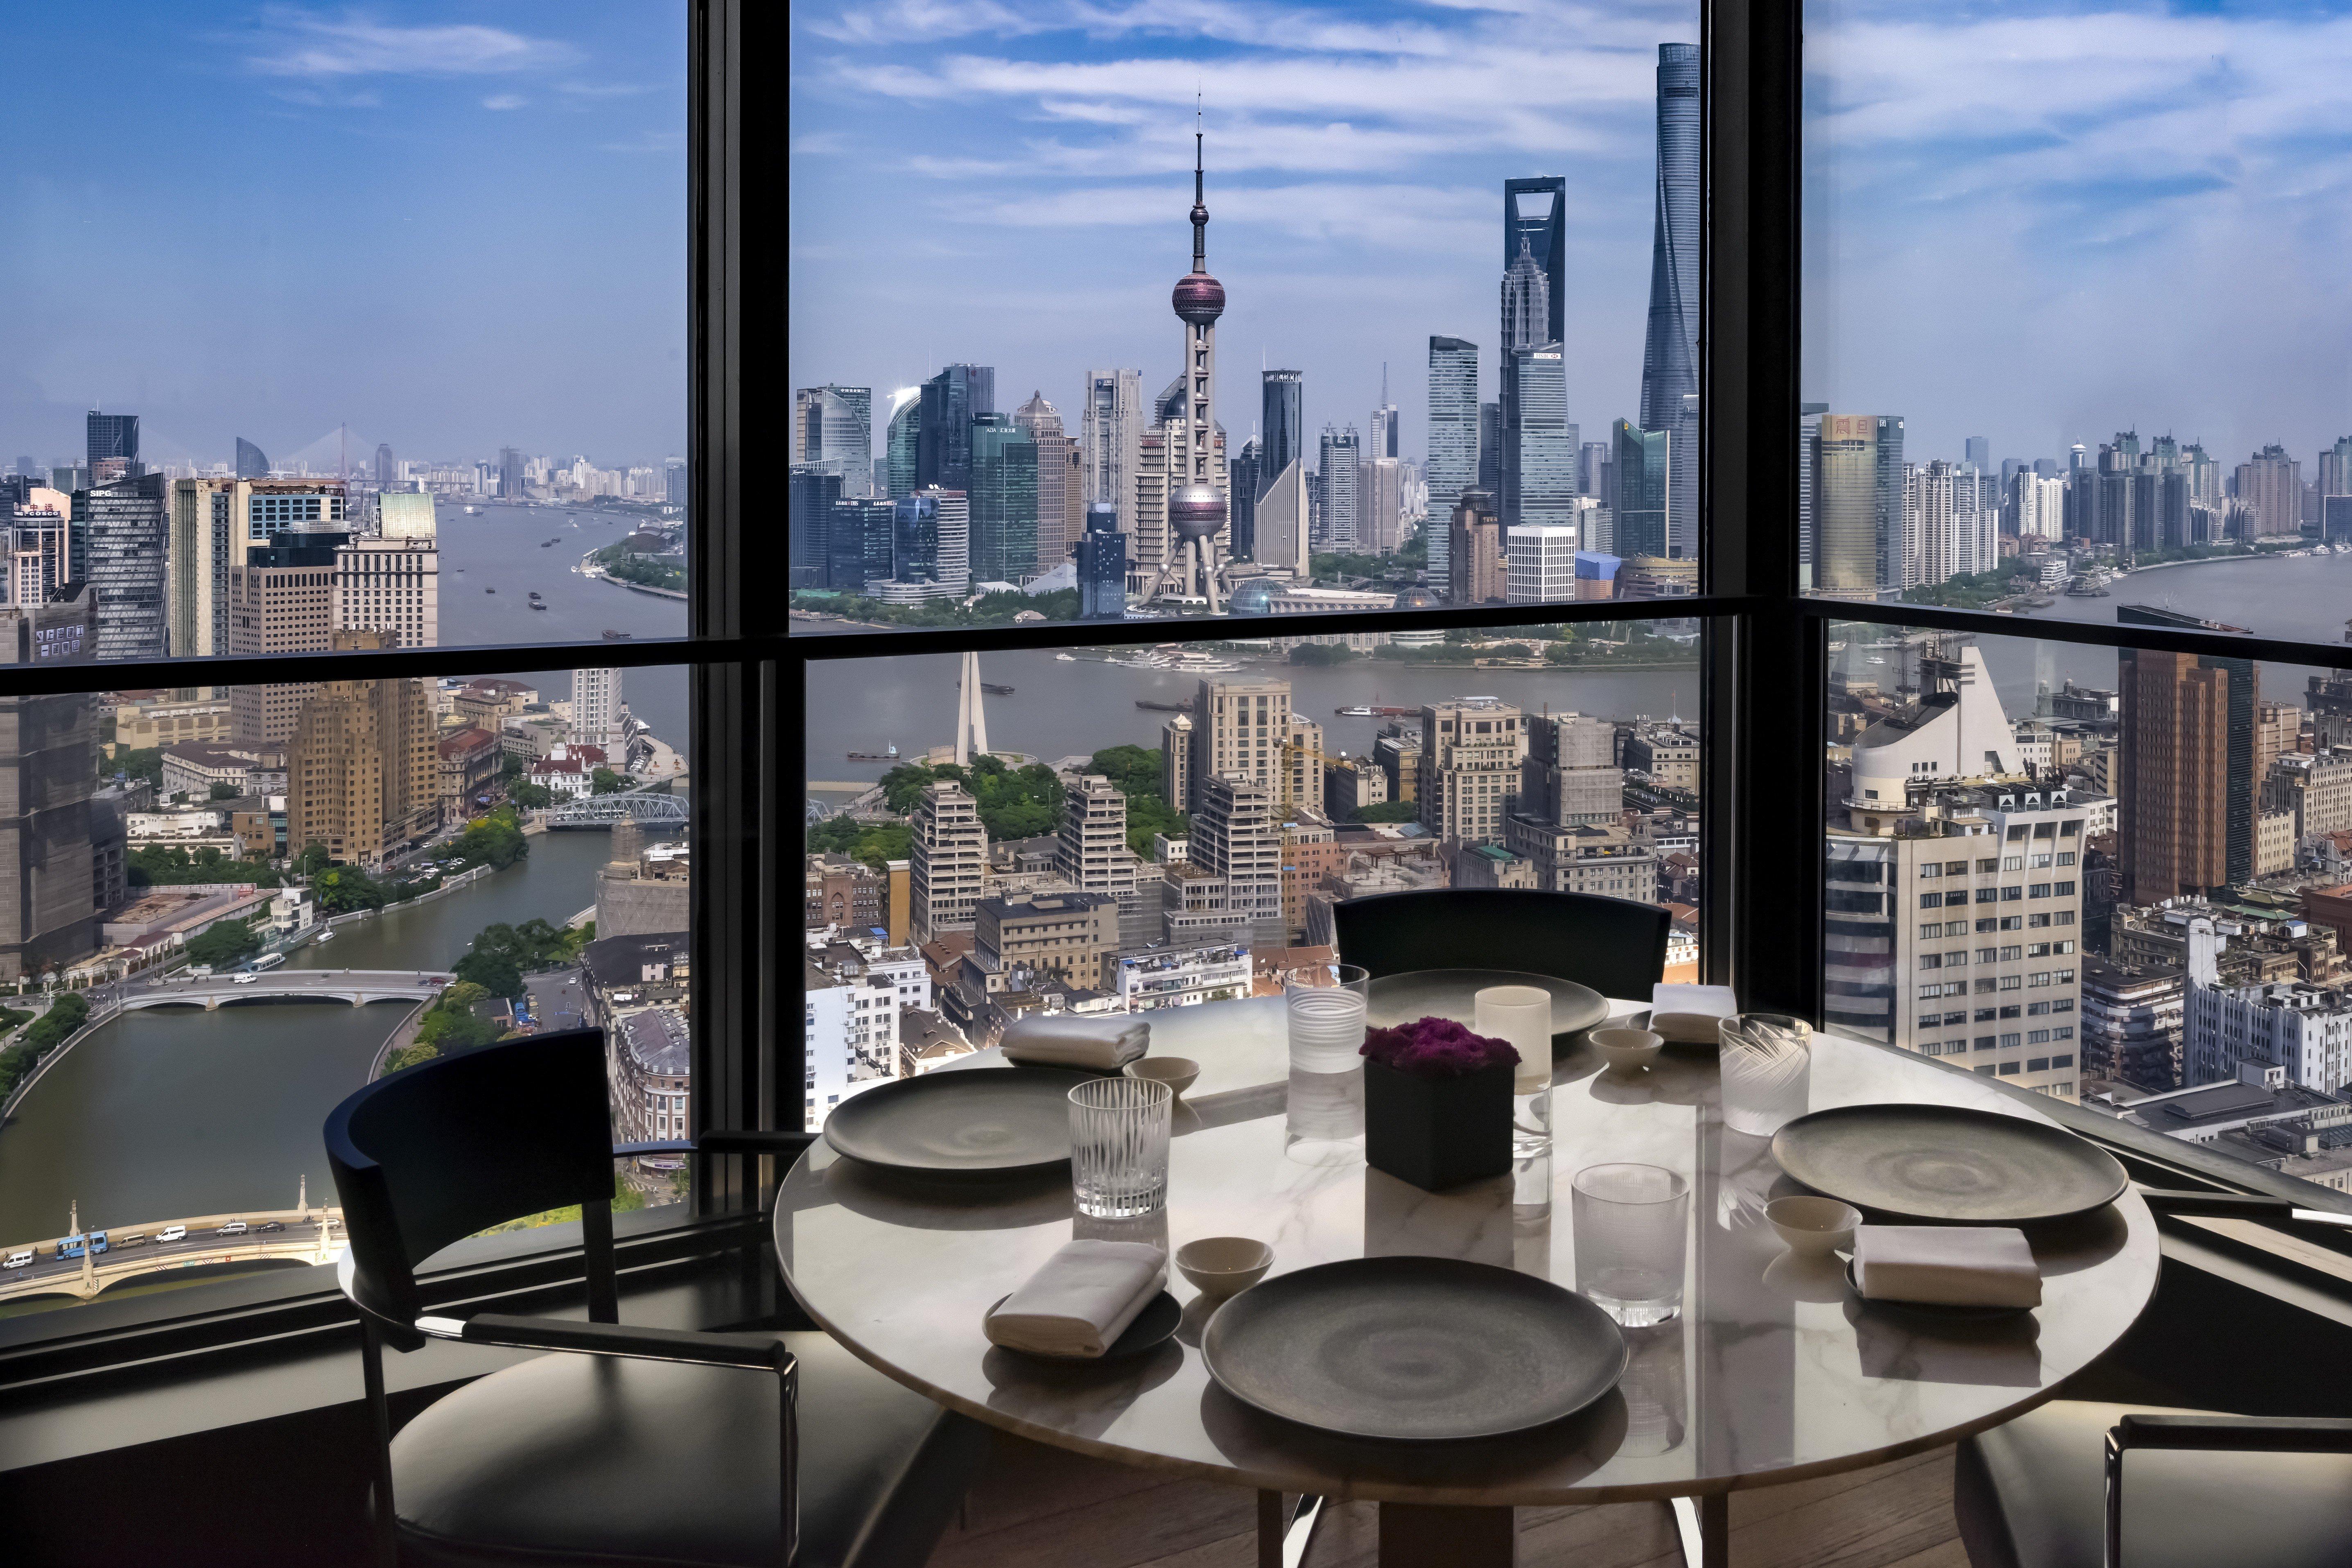 US destinations scramble to win back Chinese tourists   South China